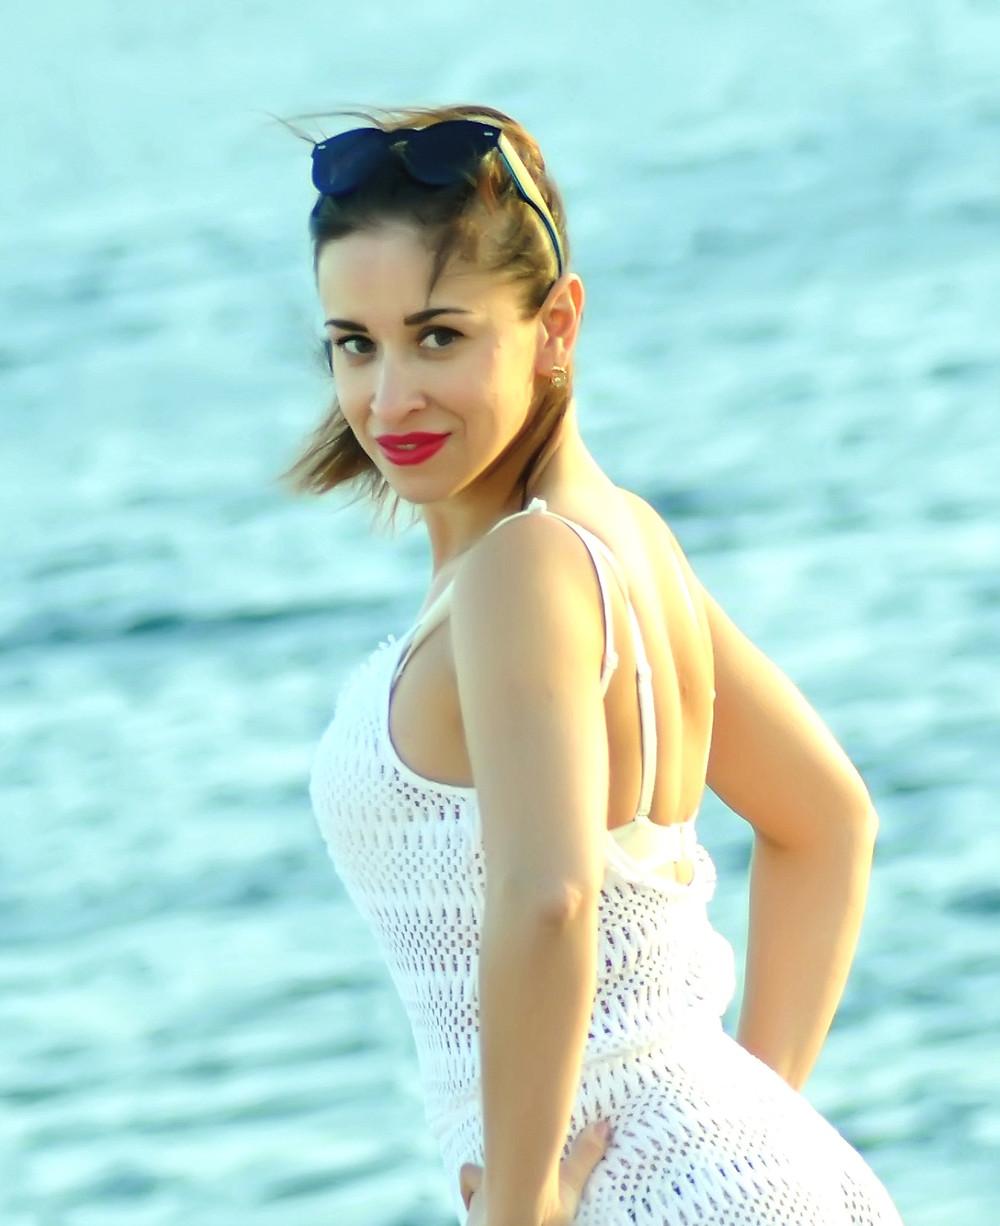 Matchmaking agency Princess date, beautiful blond blue eyes Russian girl beautiful girl Russian dating agency